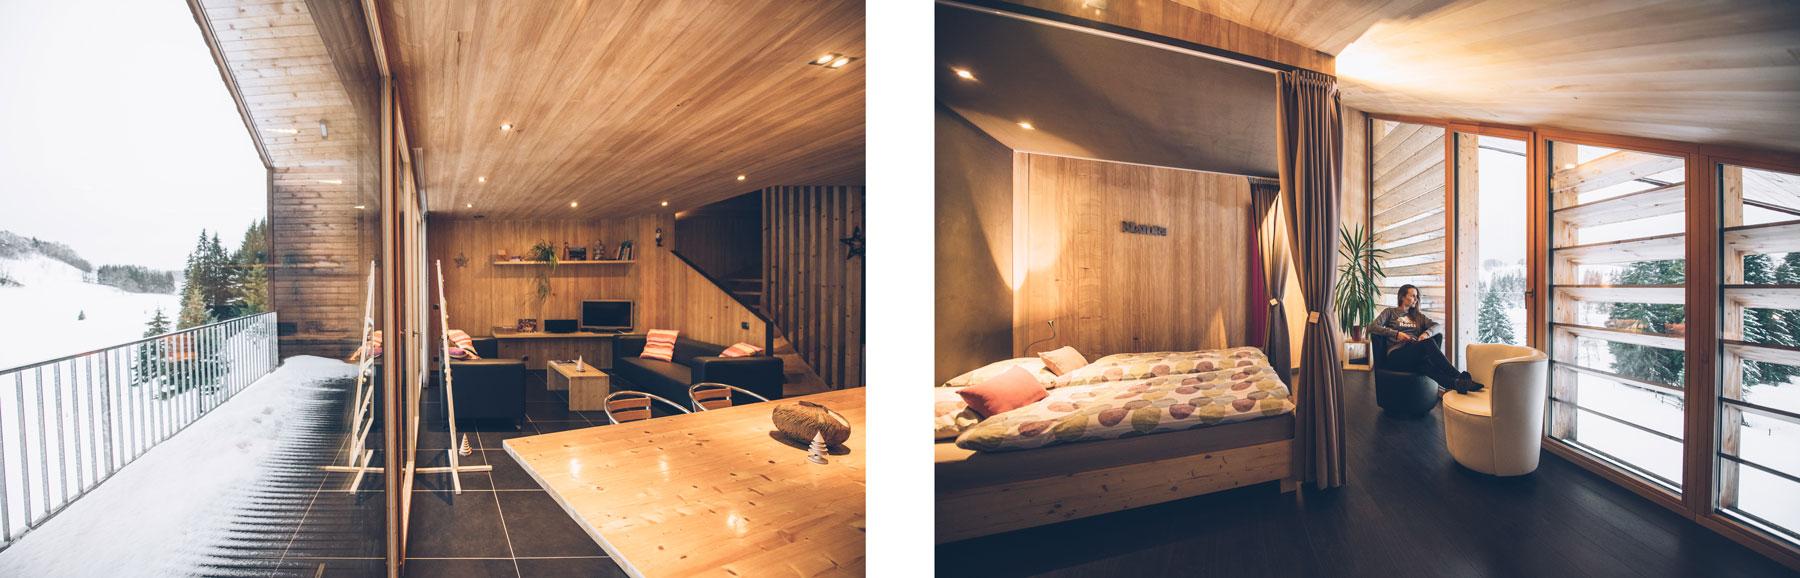 Chalet eco design Jura